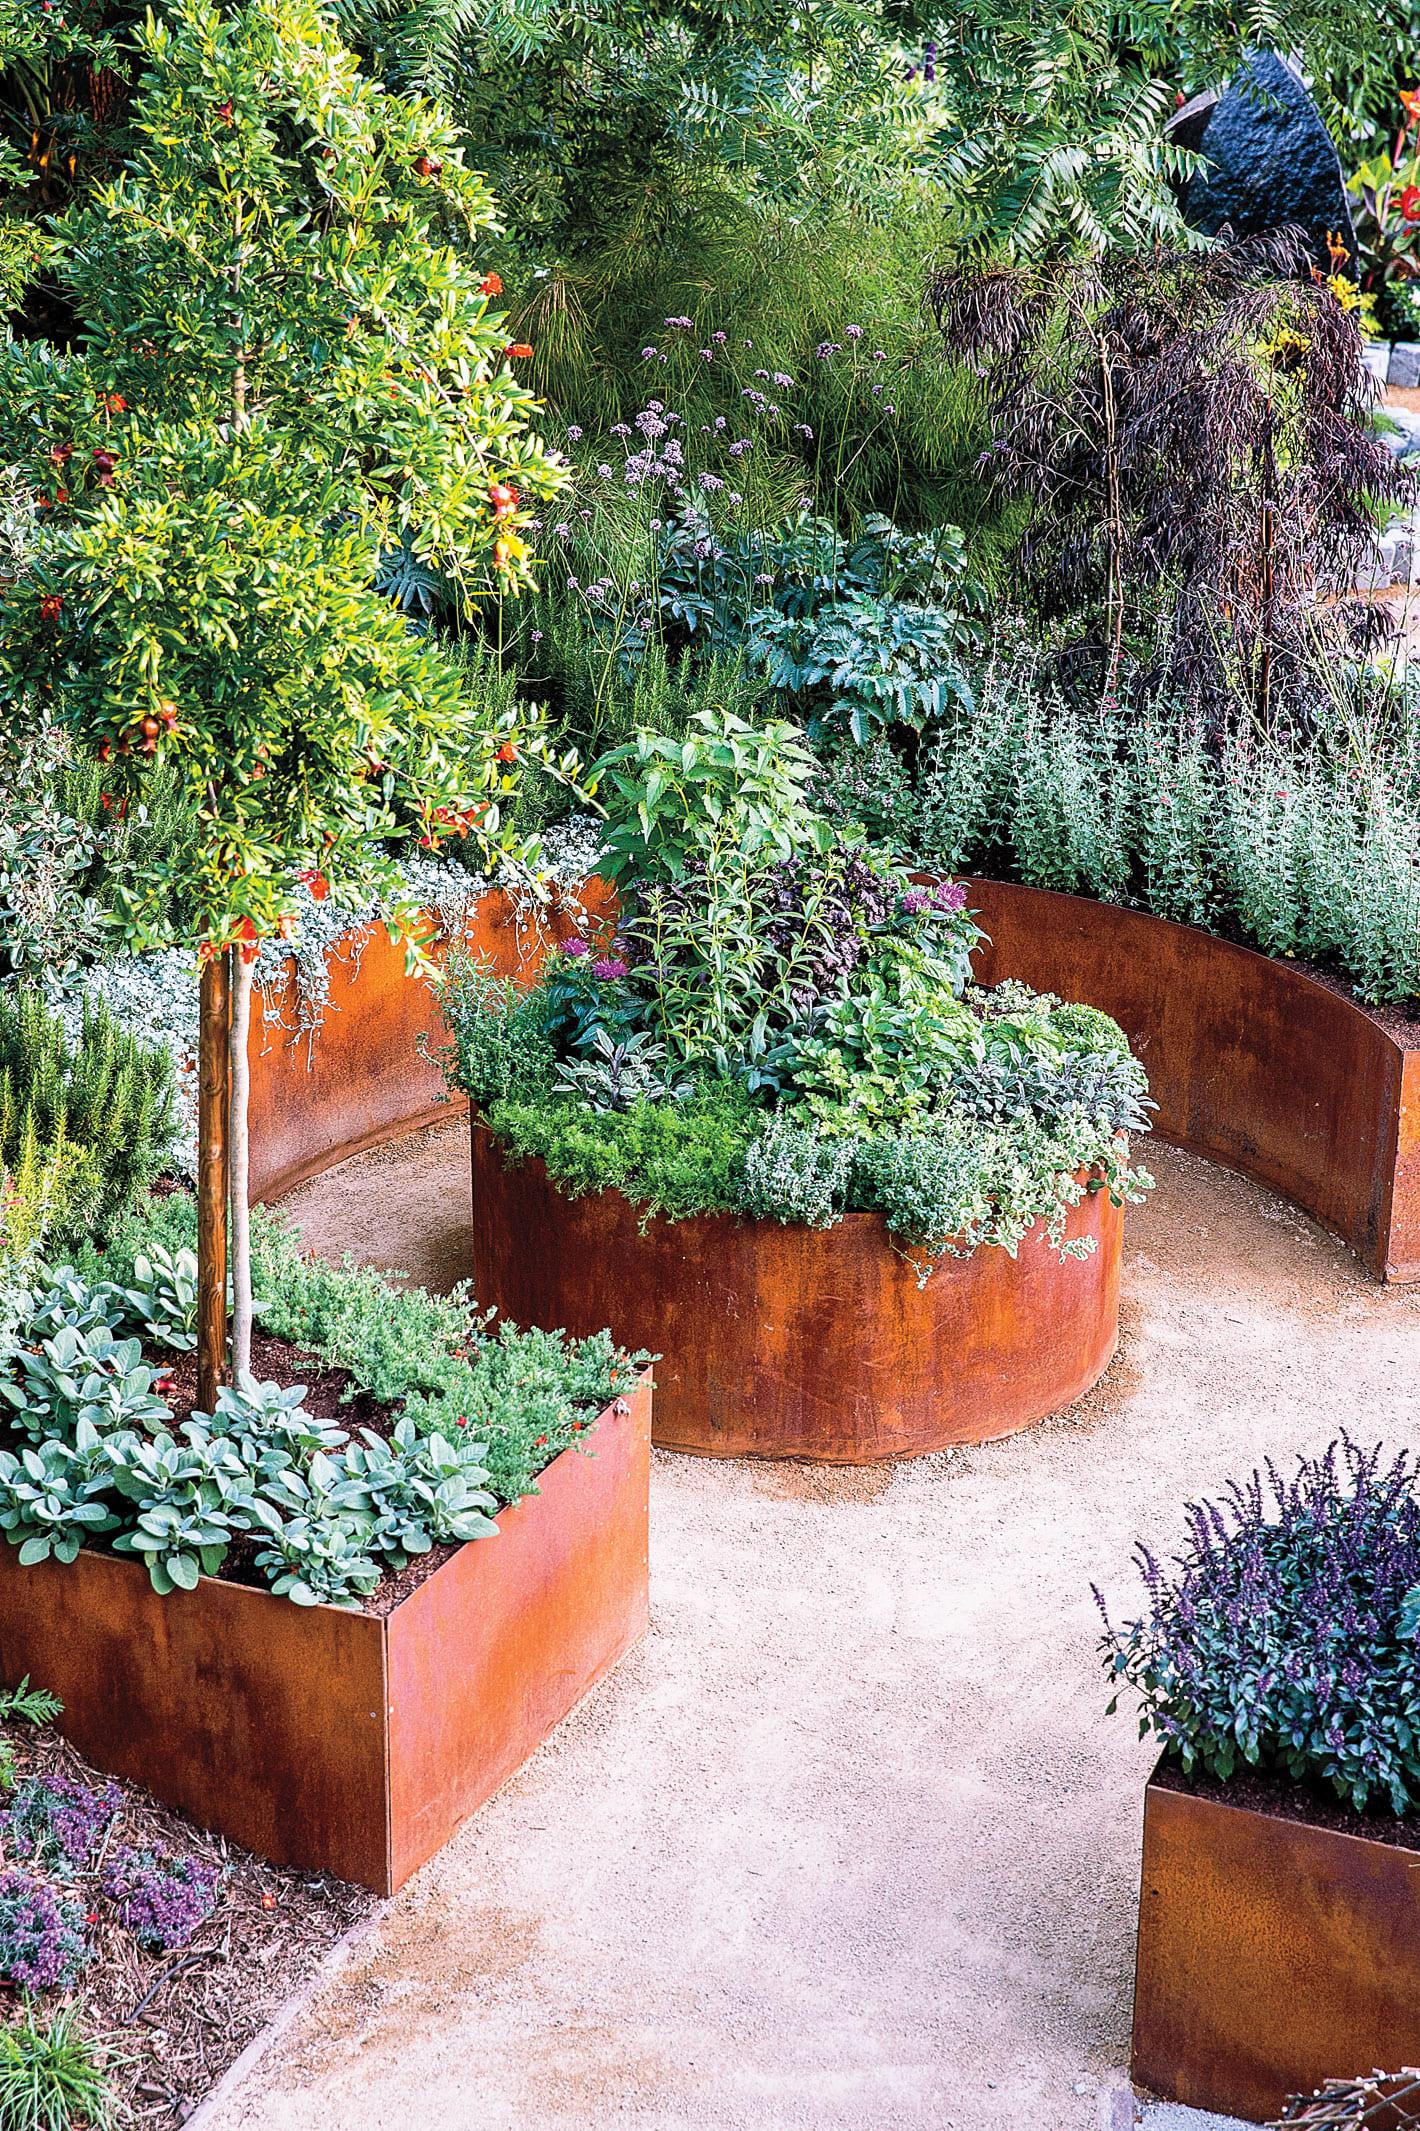 Simphome.com sunset magazine intended for edible garden ideas